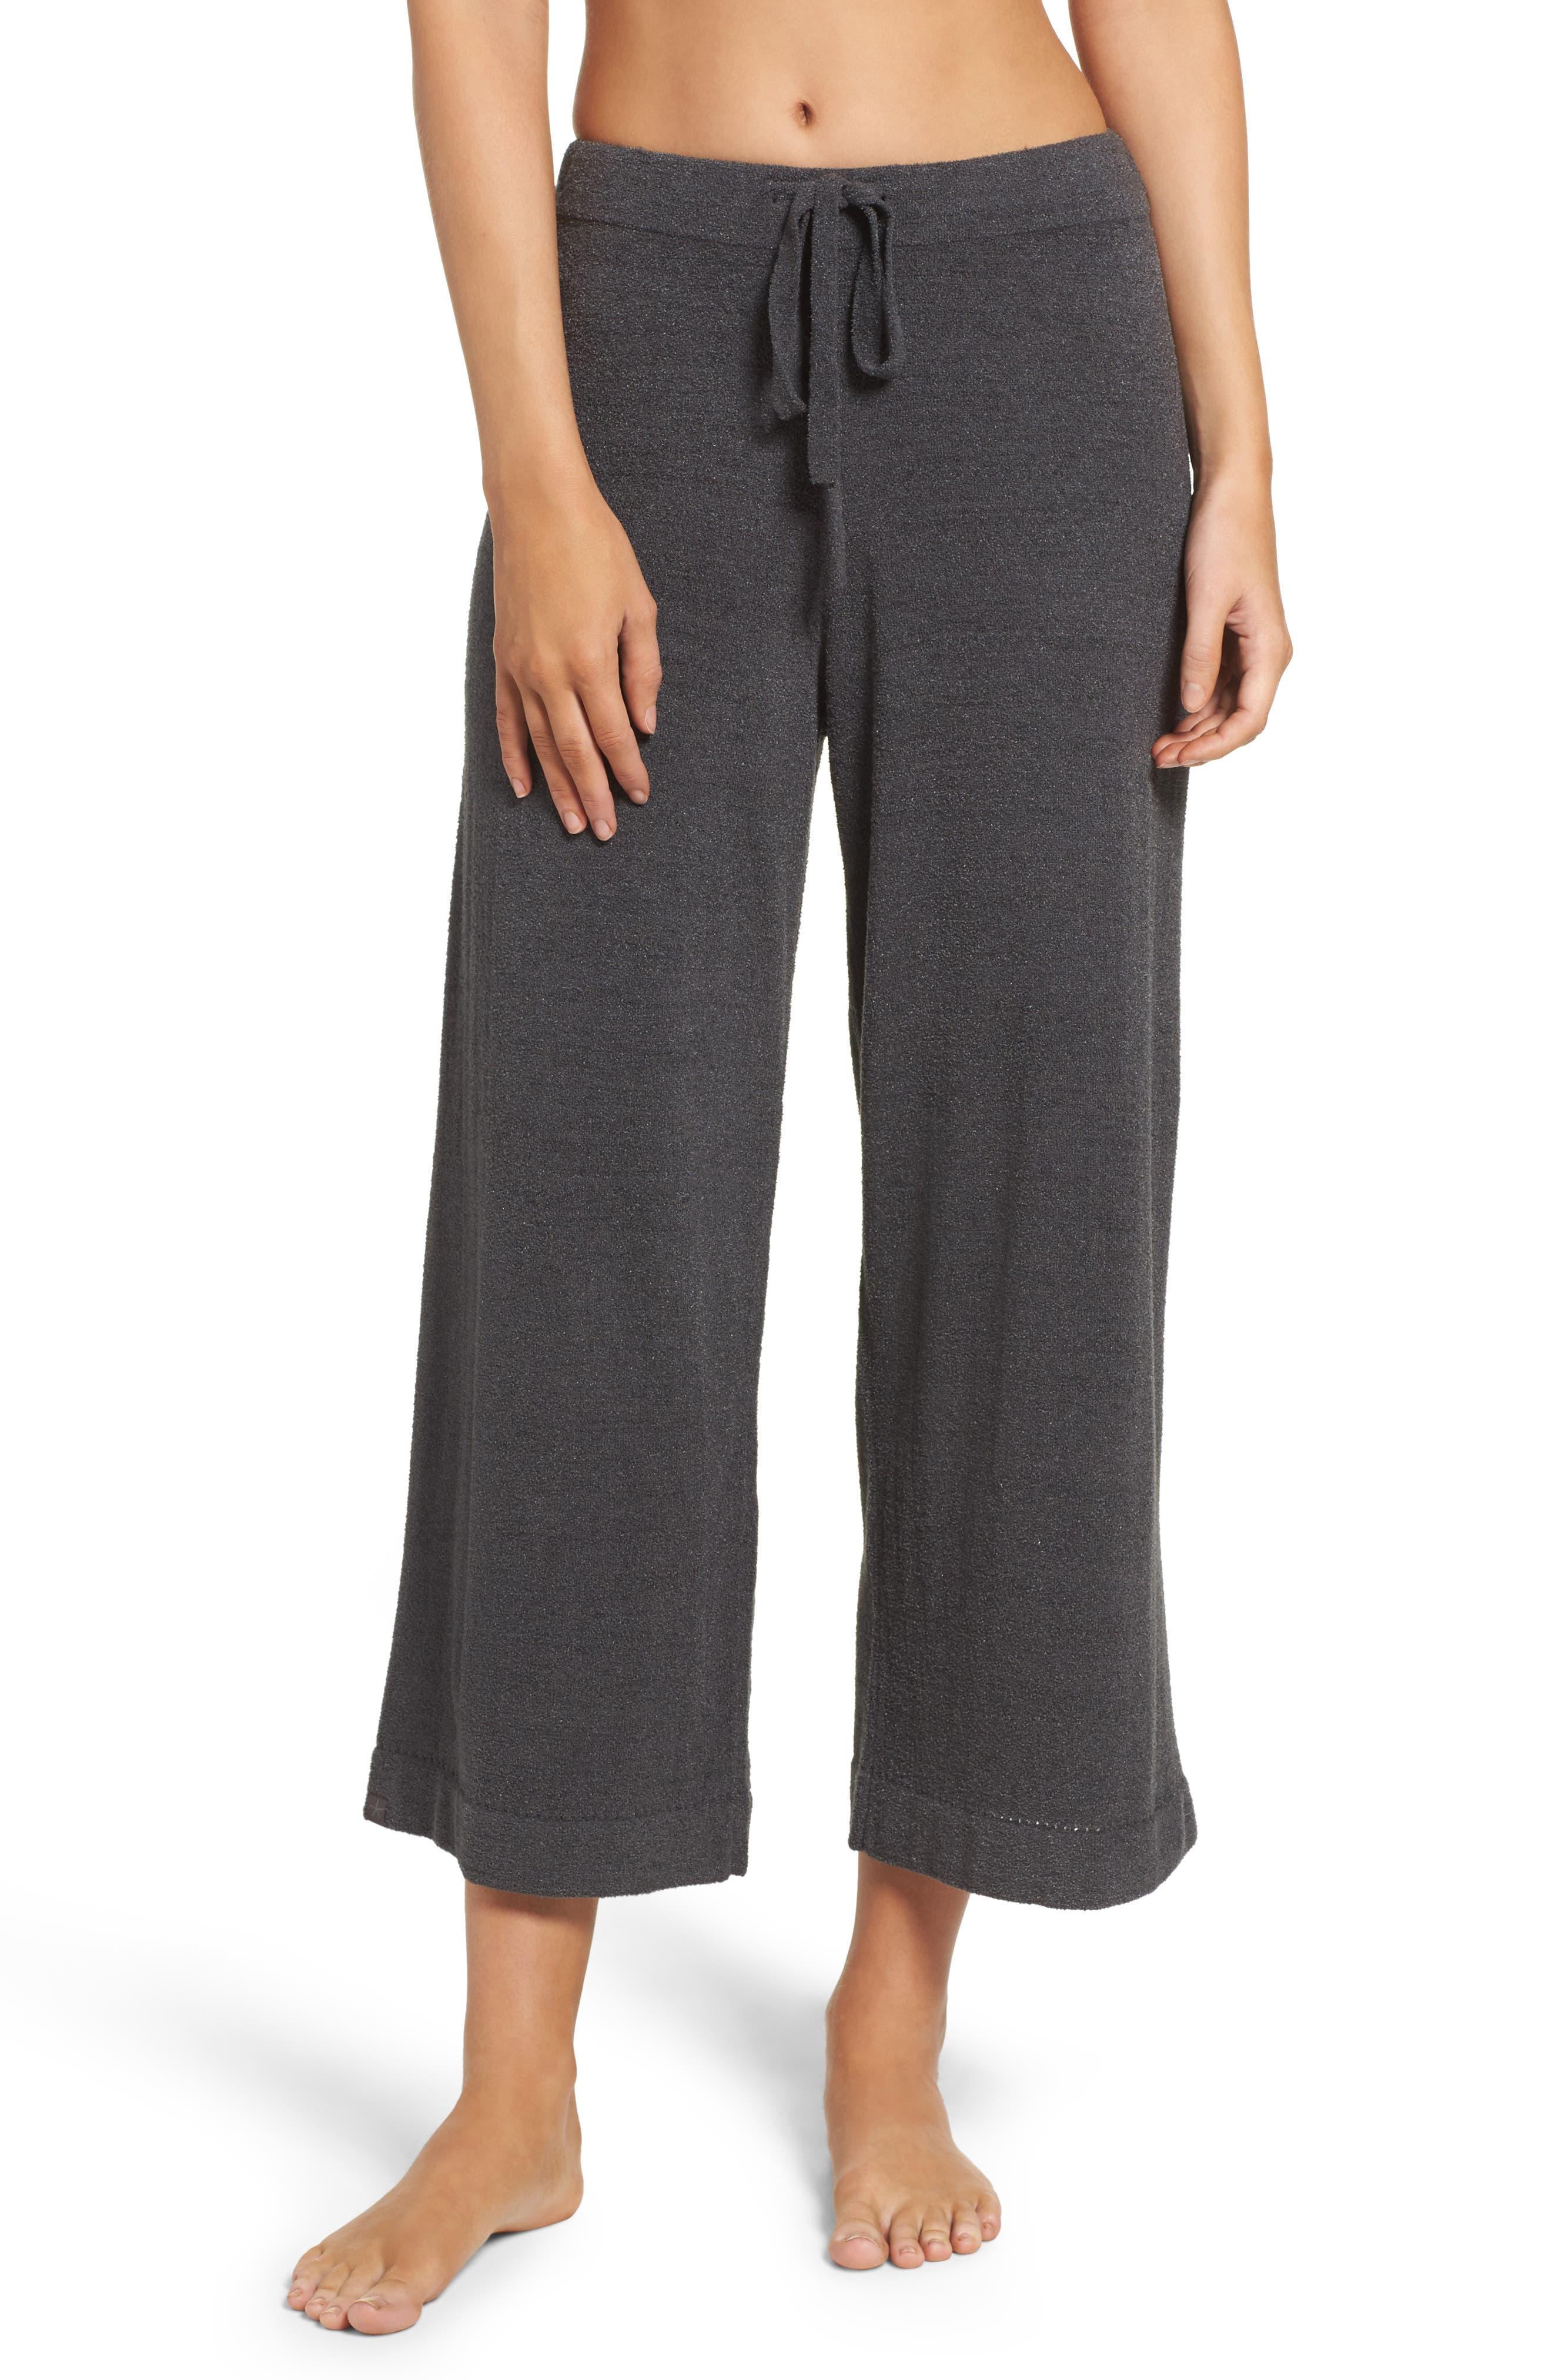 Barefoot Dreams(R) Cozychic Ultra Lite(R) Culotte Lounge Pants